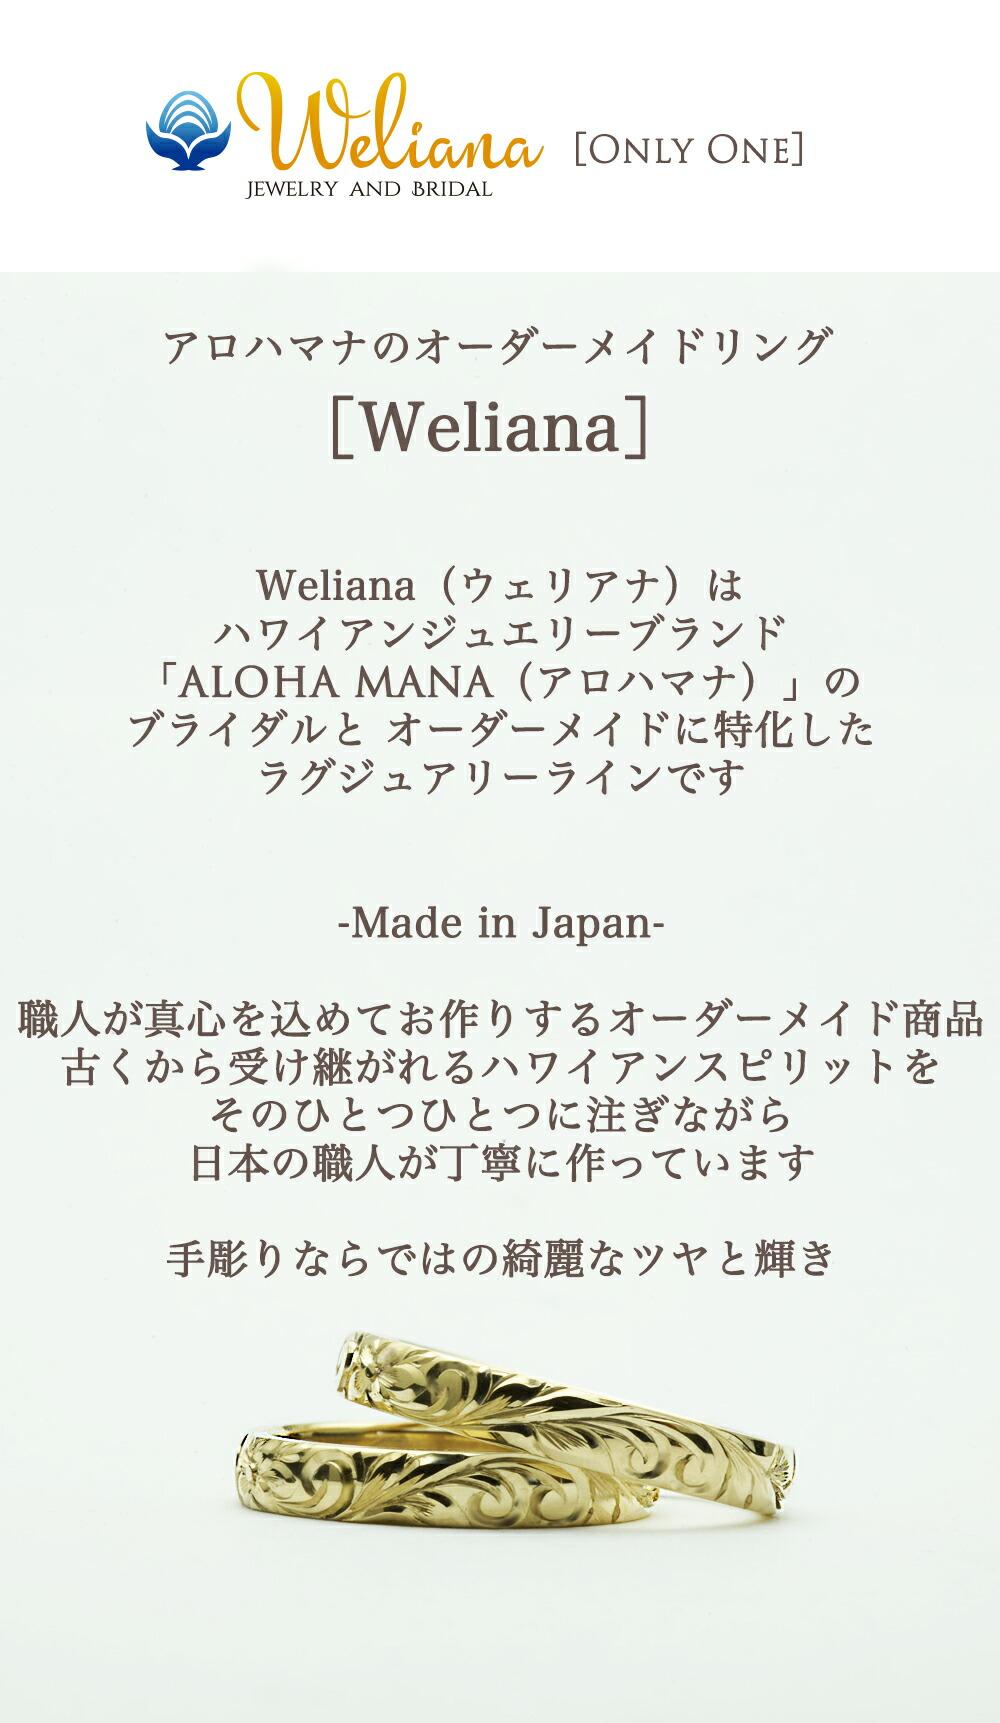 Weliana(ウェリアナ)ブランド